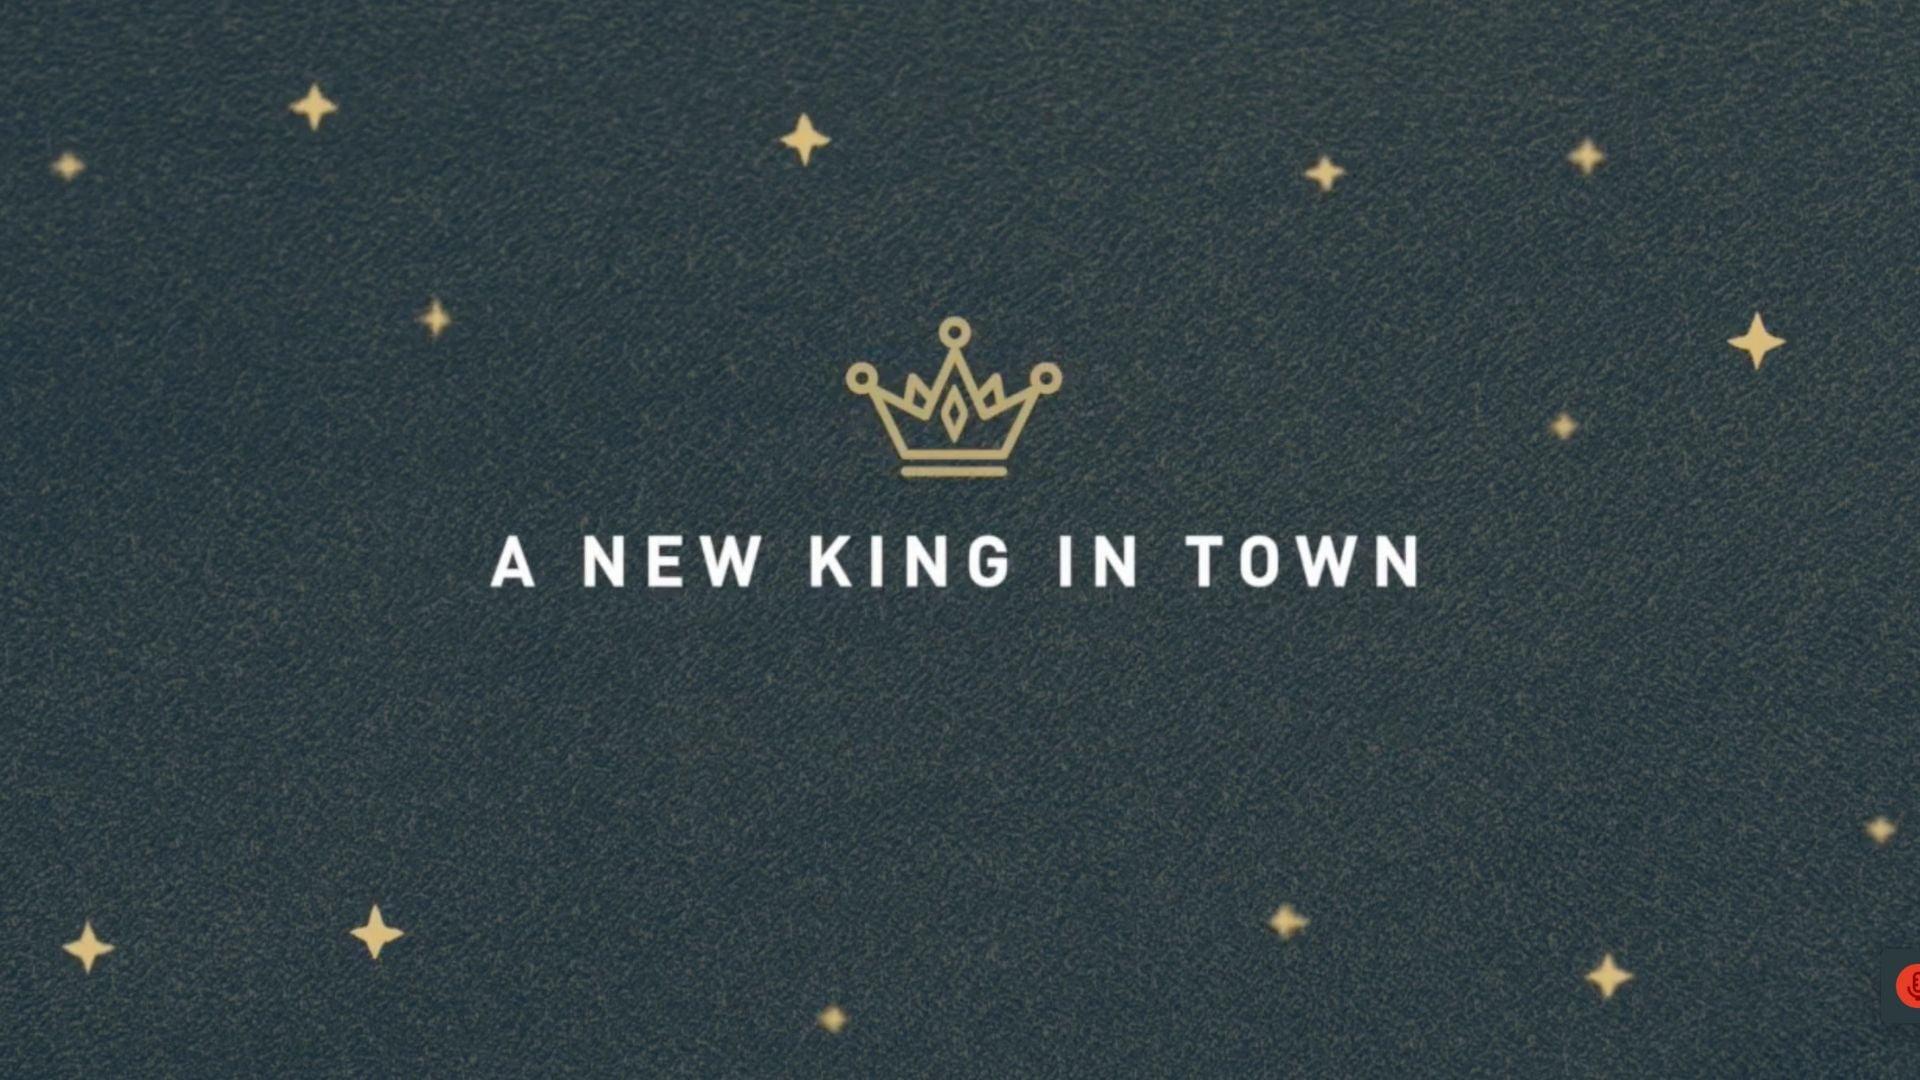 Jesus, the Preeminent King - December 22, 2019